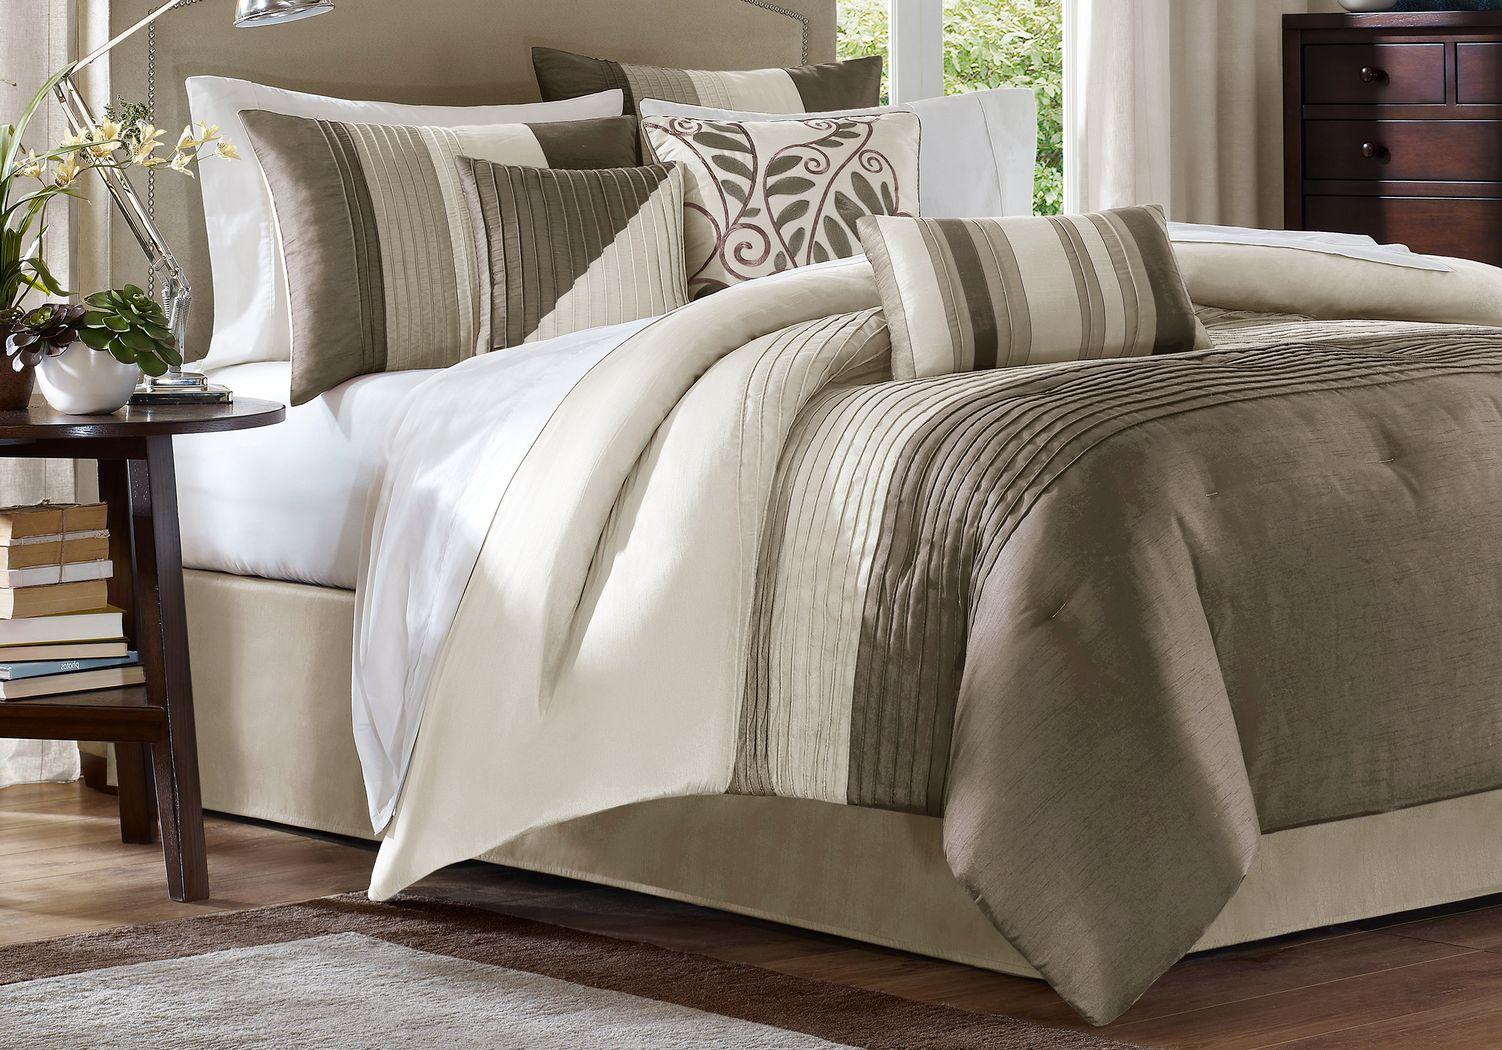 Brenna Natural 7 Pc King Comforter Set